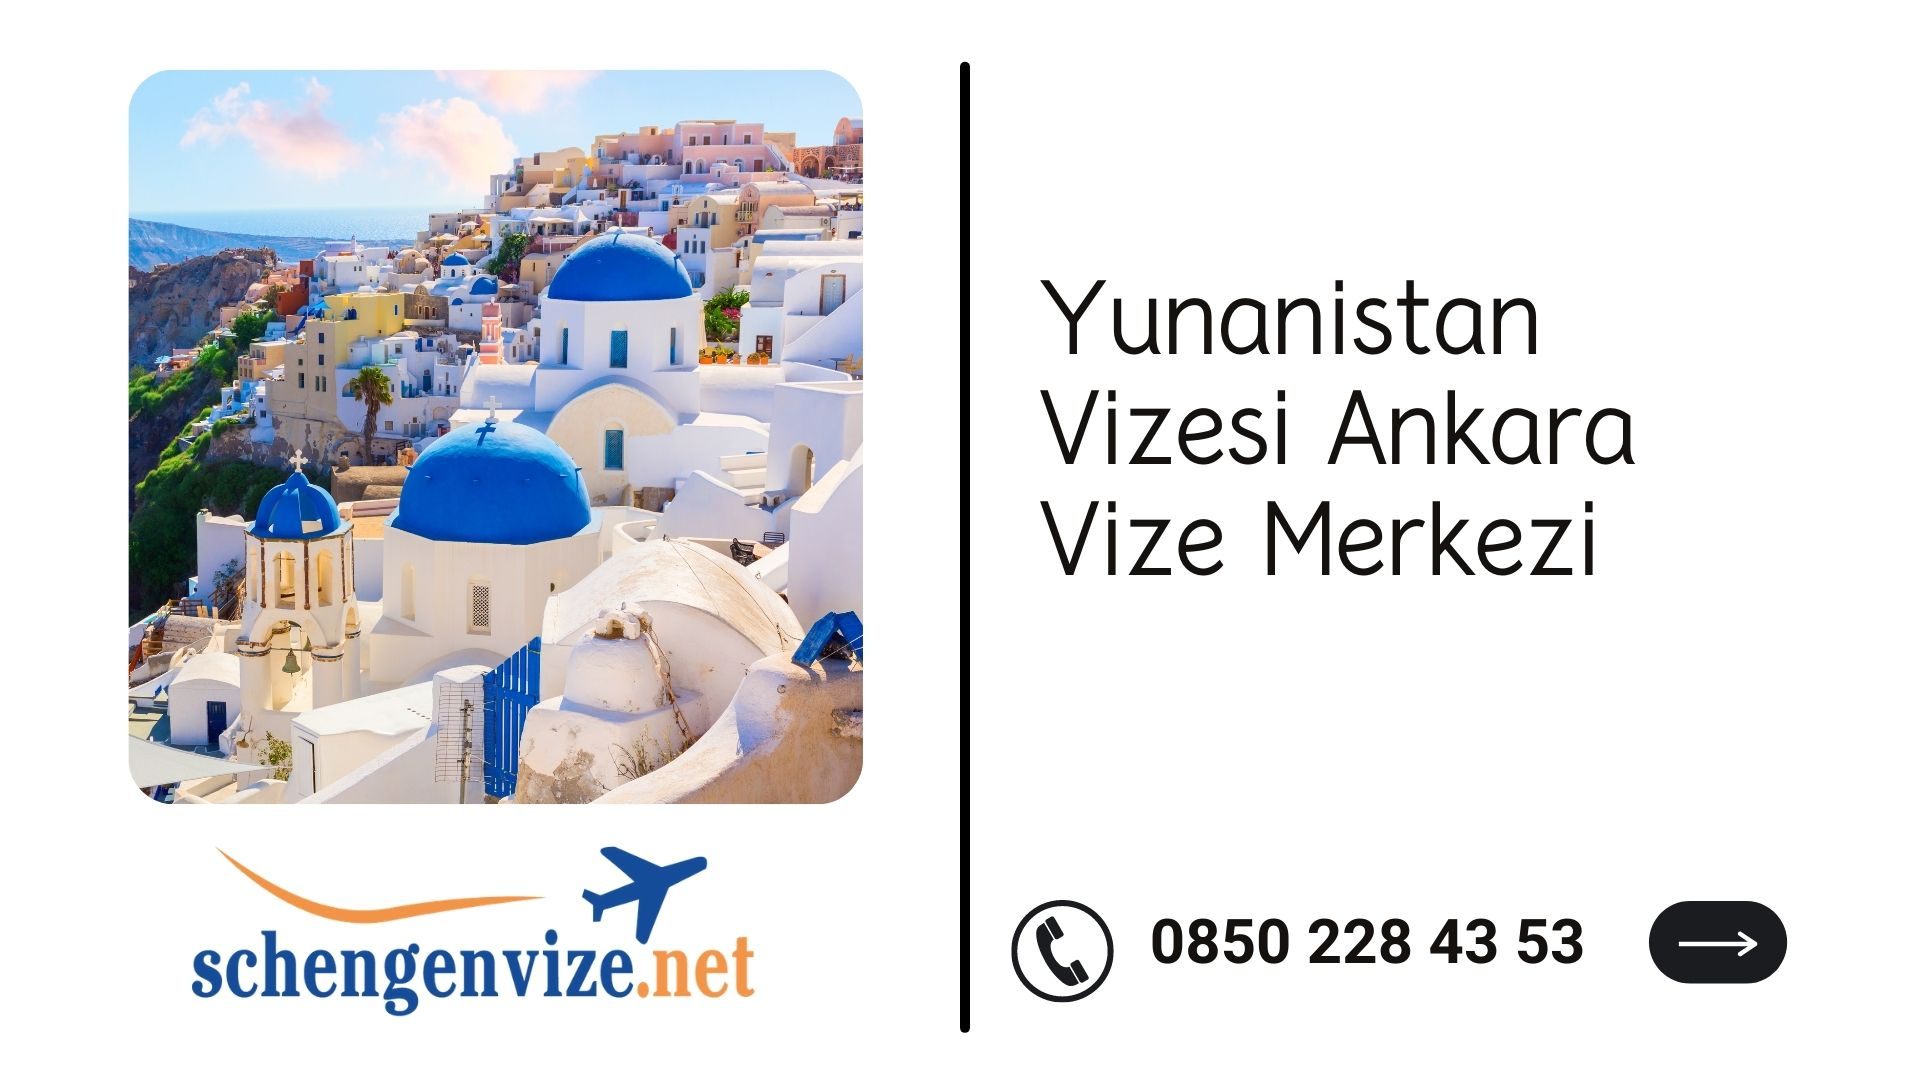 Yunanistan Vizesi Ankara Vize Merkezi